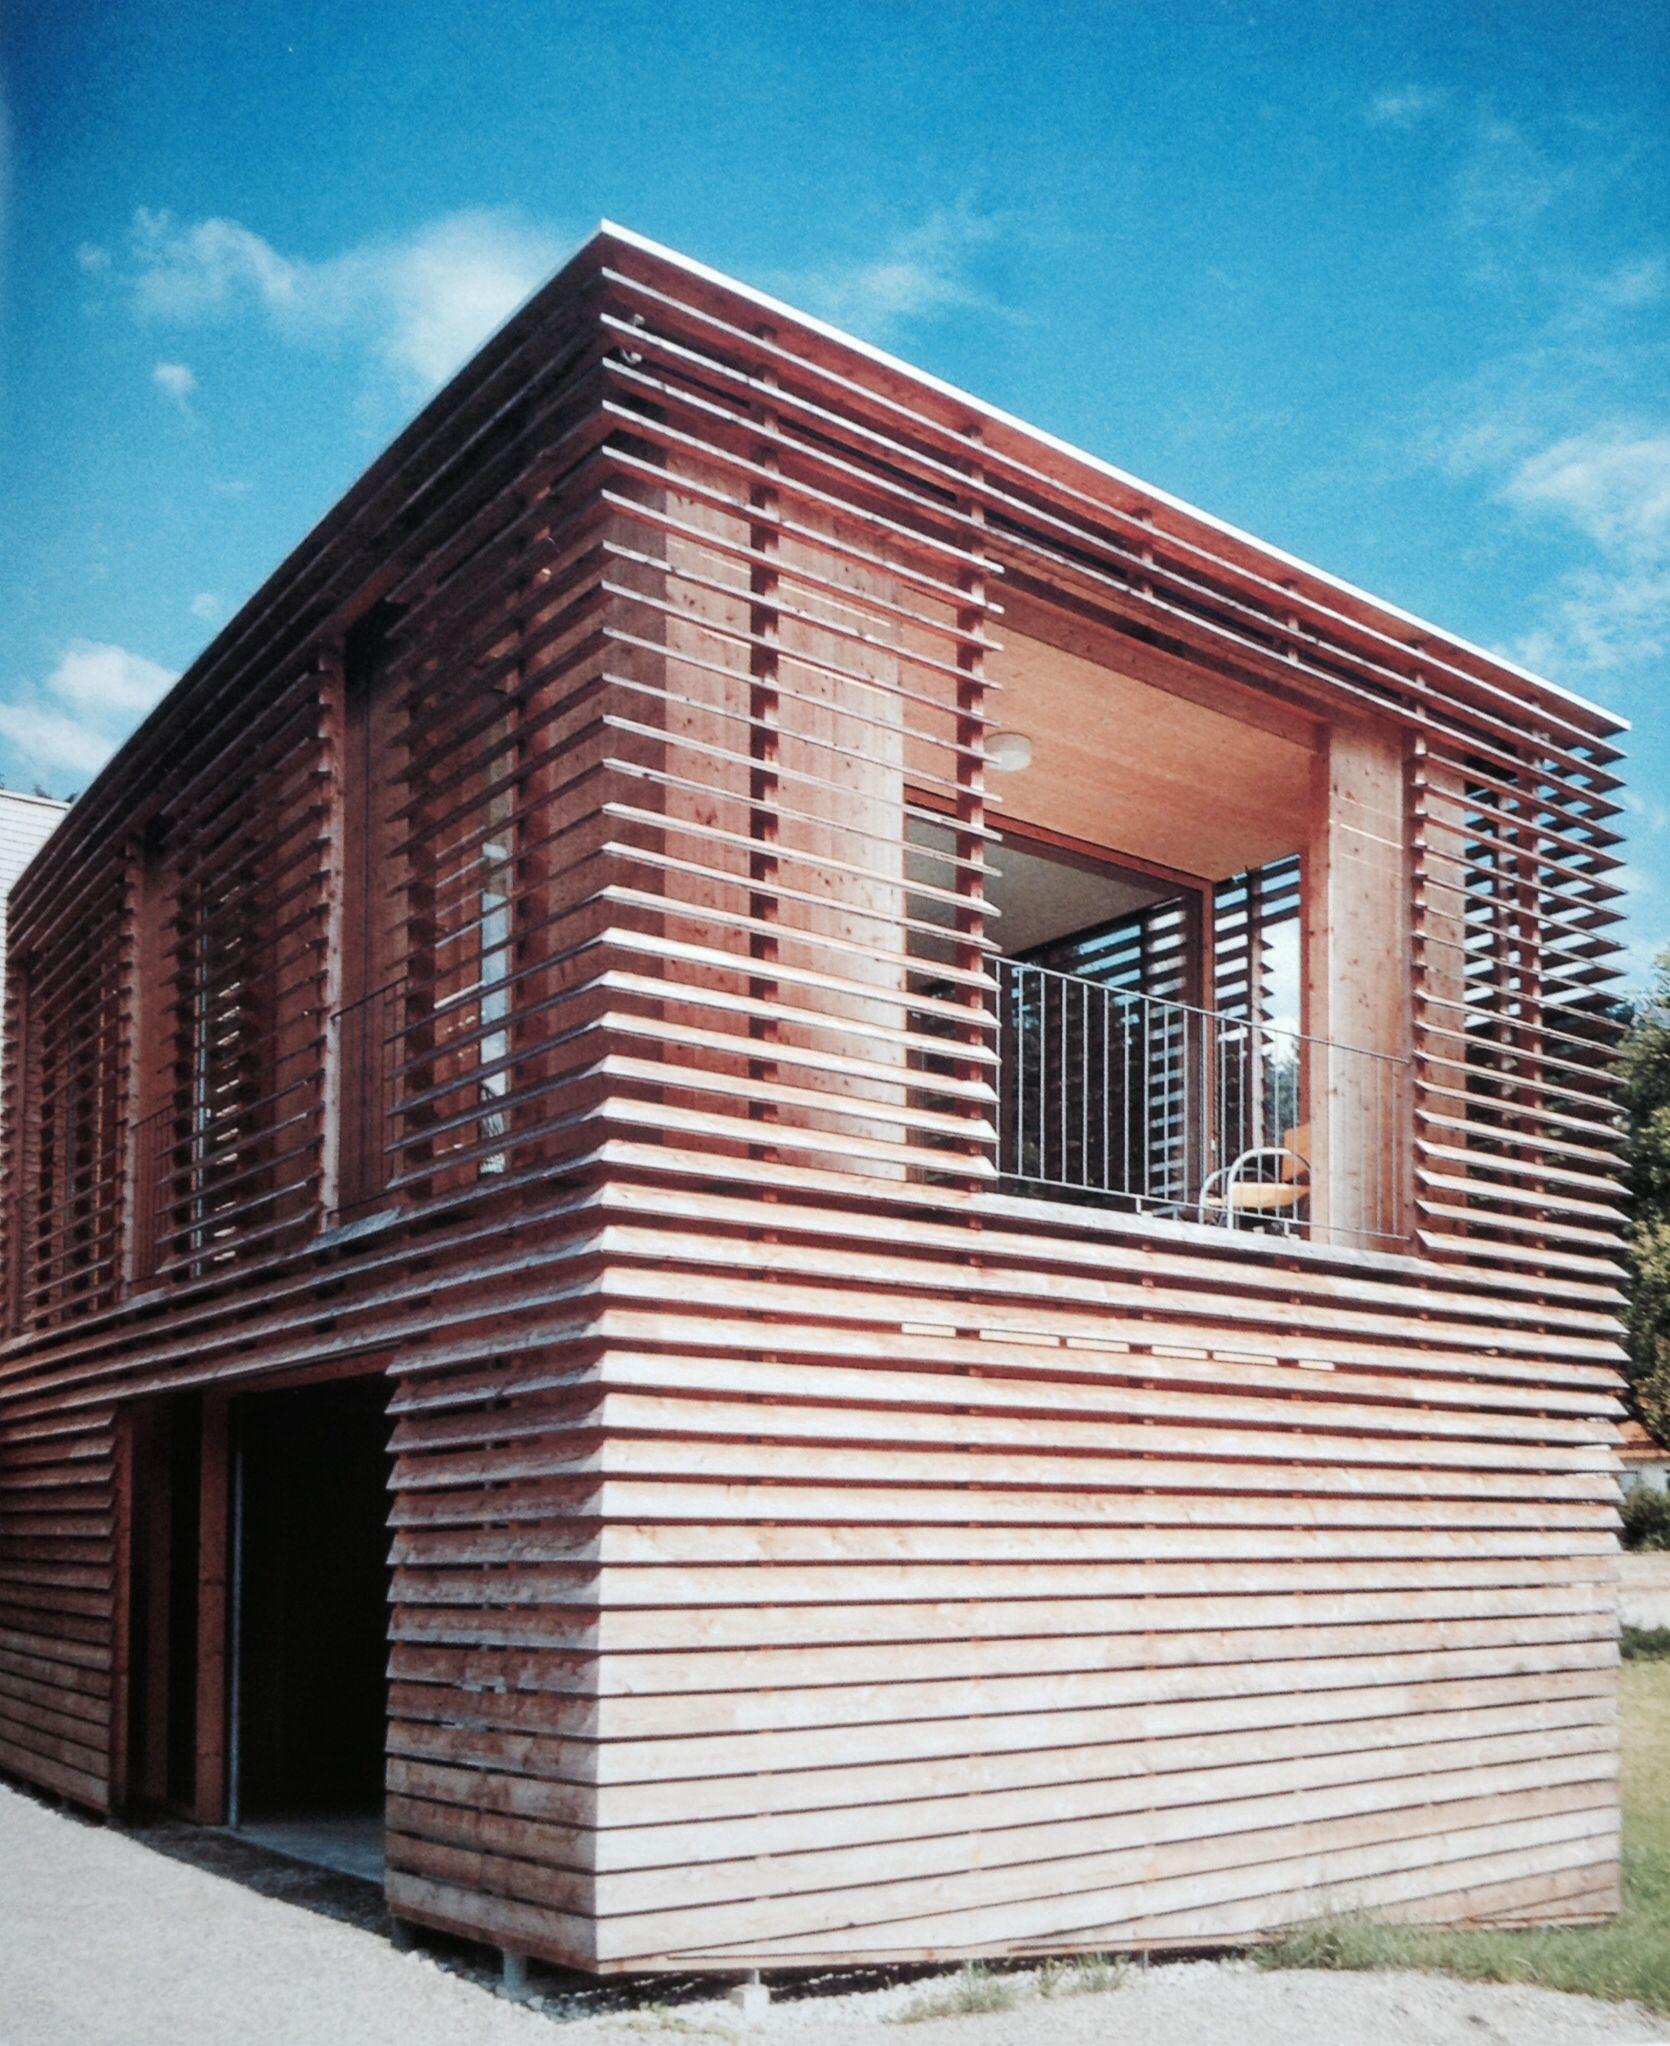 Kern house. Carlo baumschlager and dietmar Eberle | casa | Pinterest ...